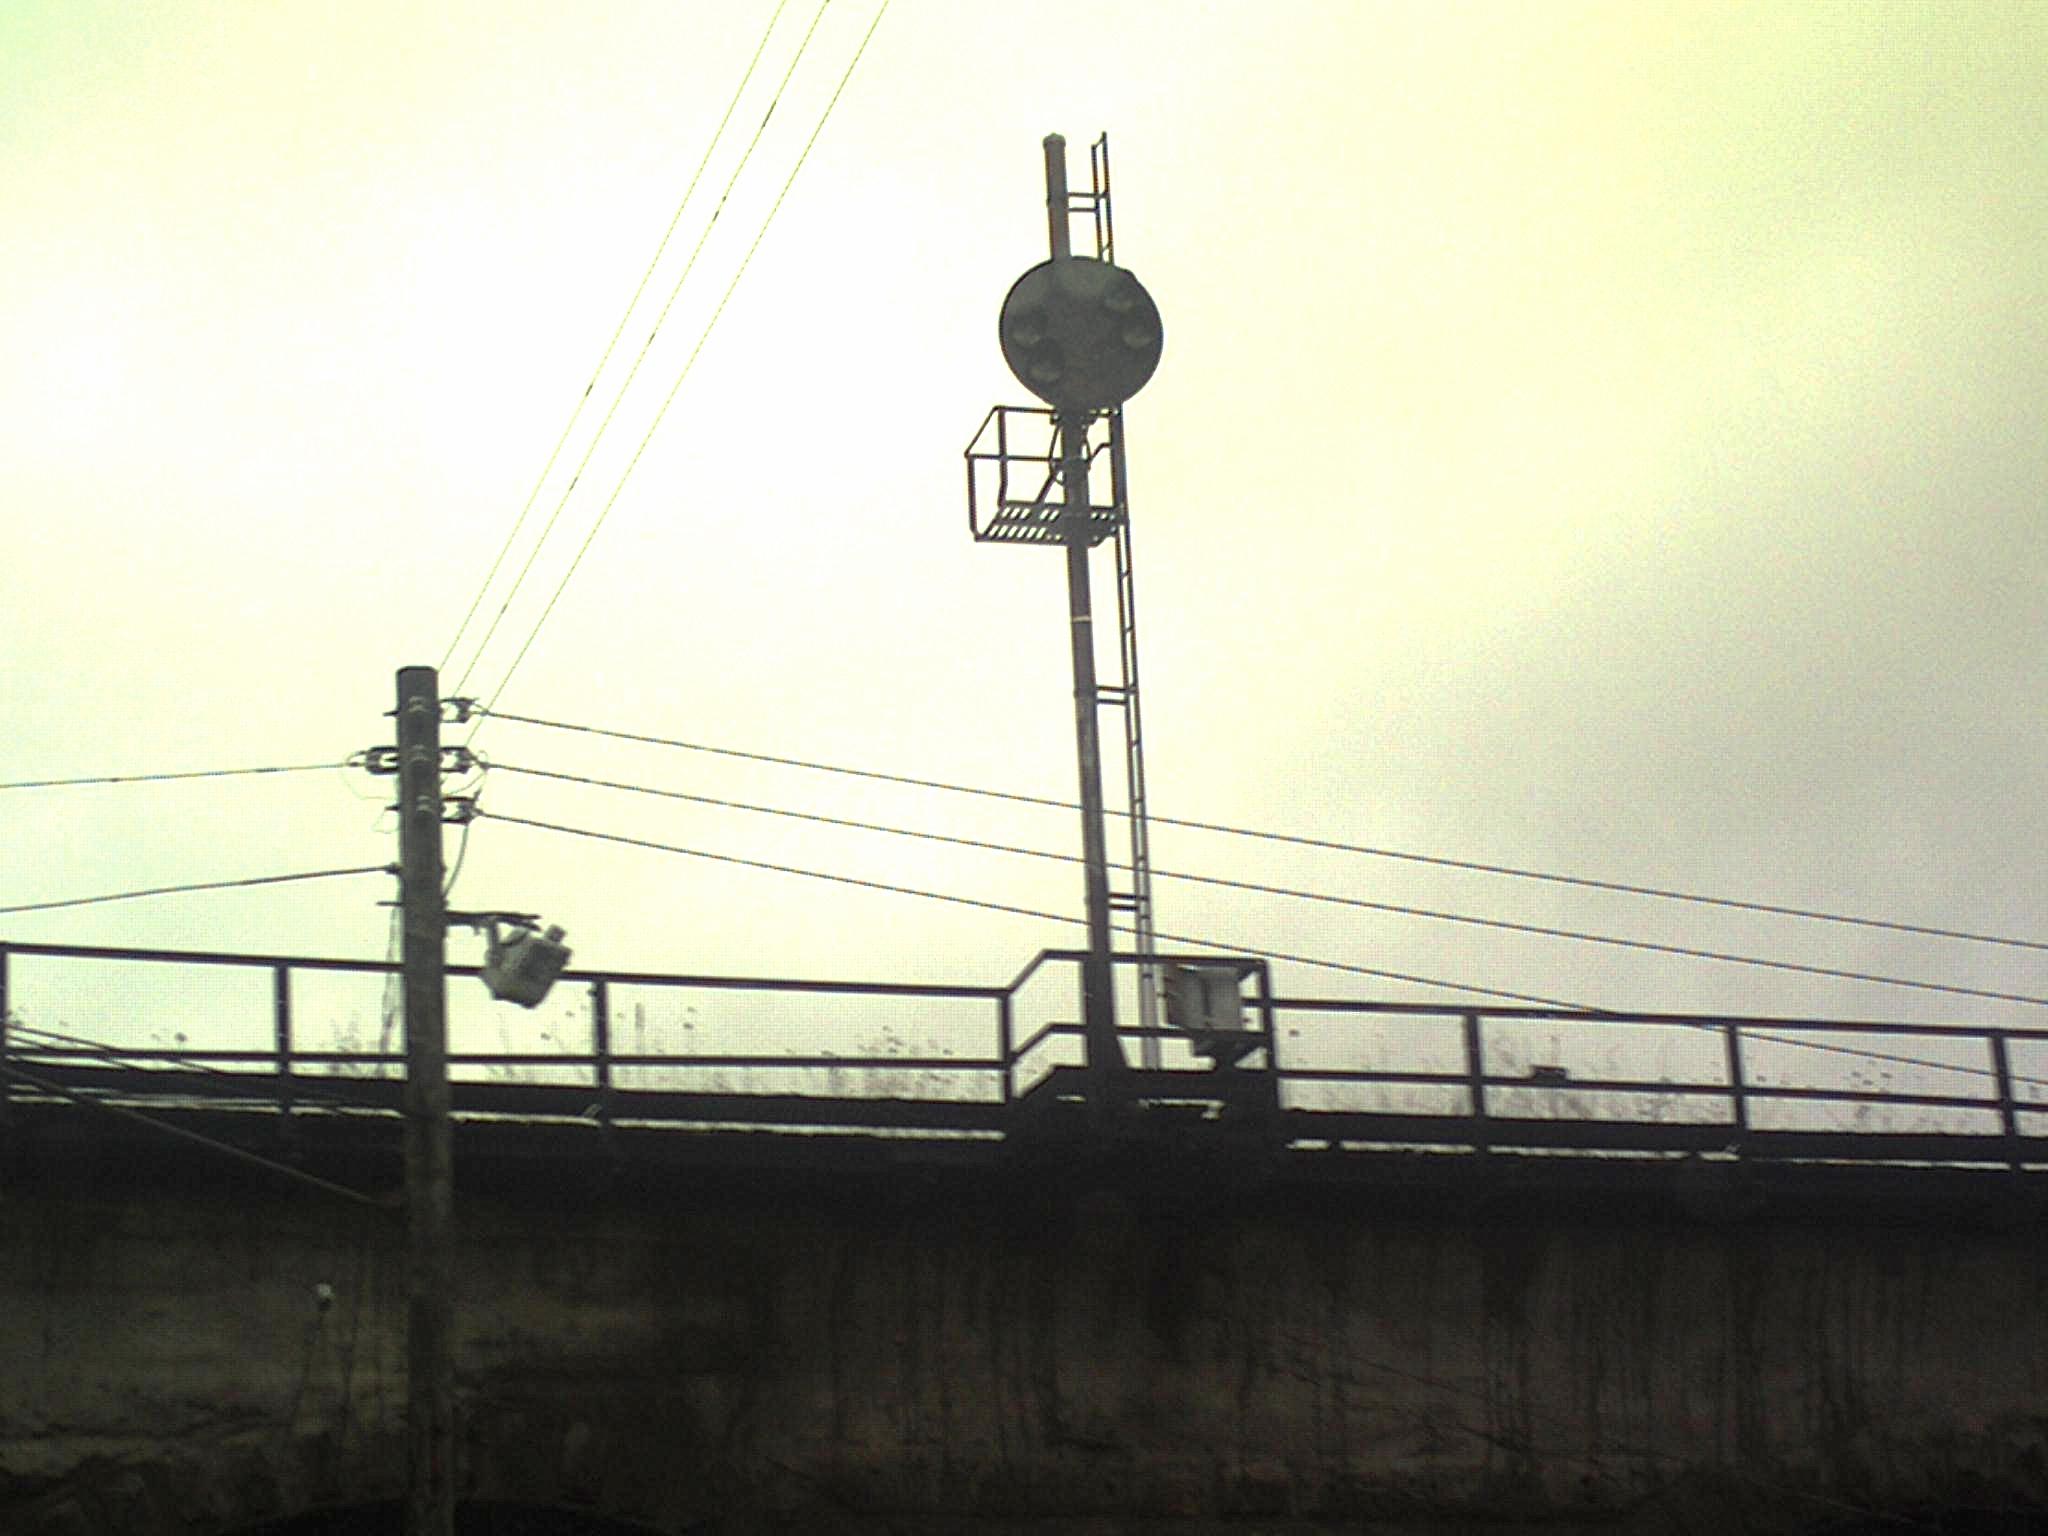 Ohio belmont county flushing - Signals Bo Railroadsignals